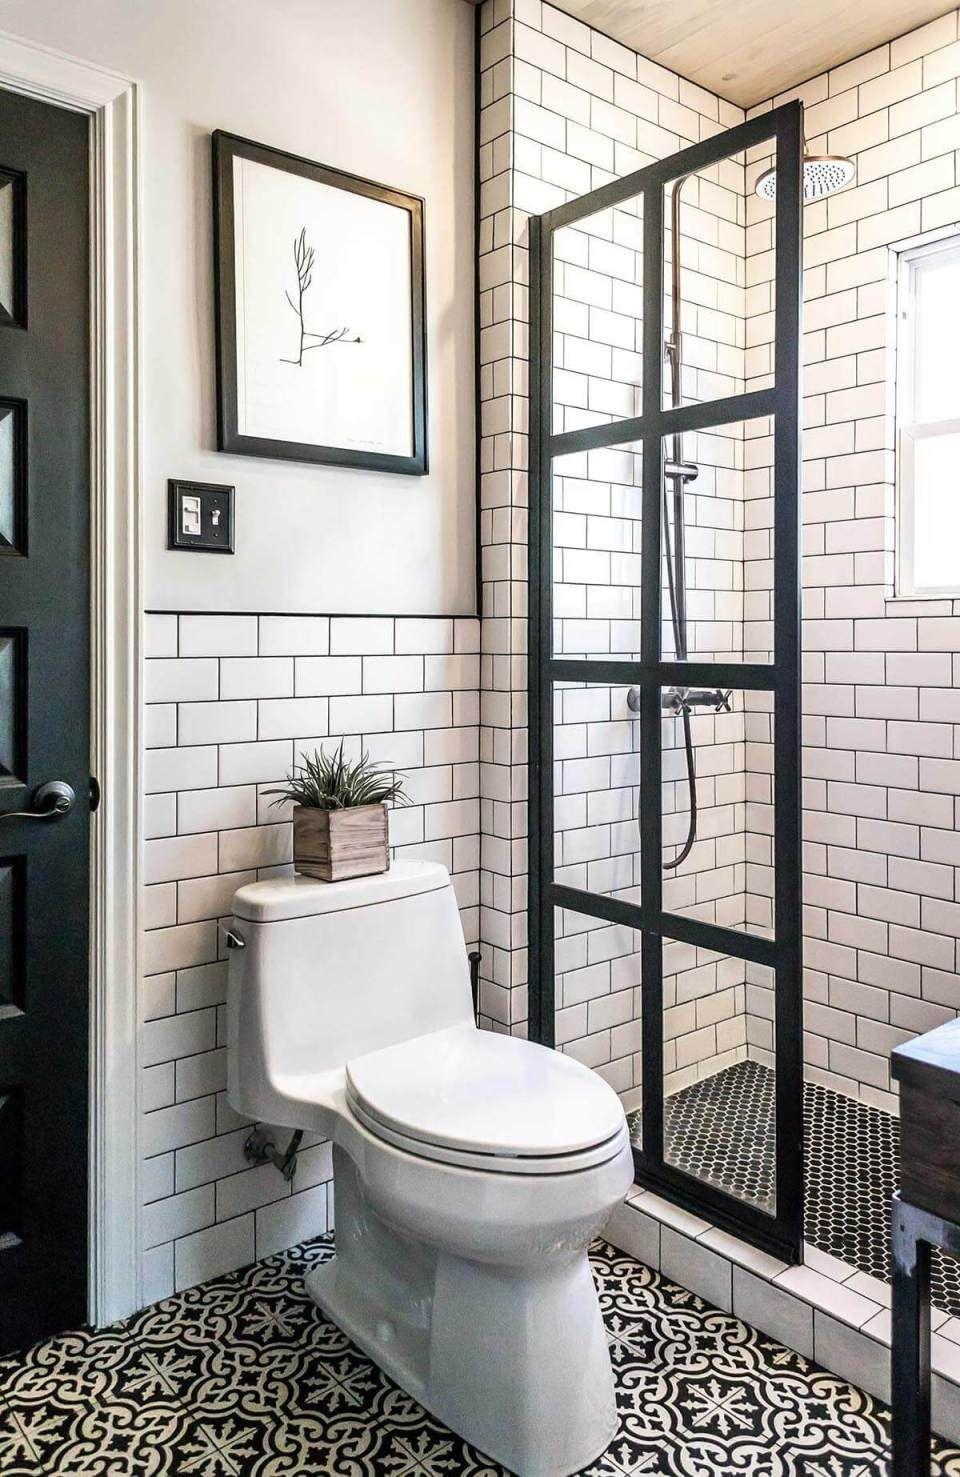 31 Stunning Shower Tile Ideas For Your Bathroom Bathroom Design